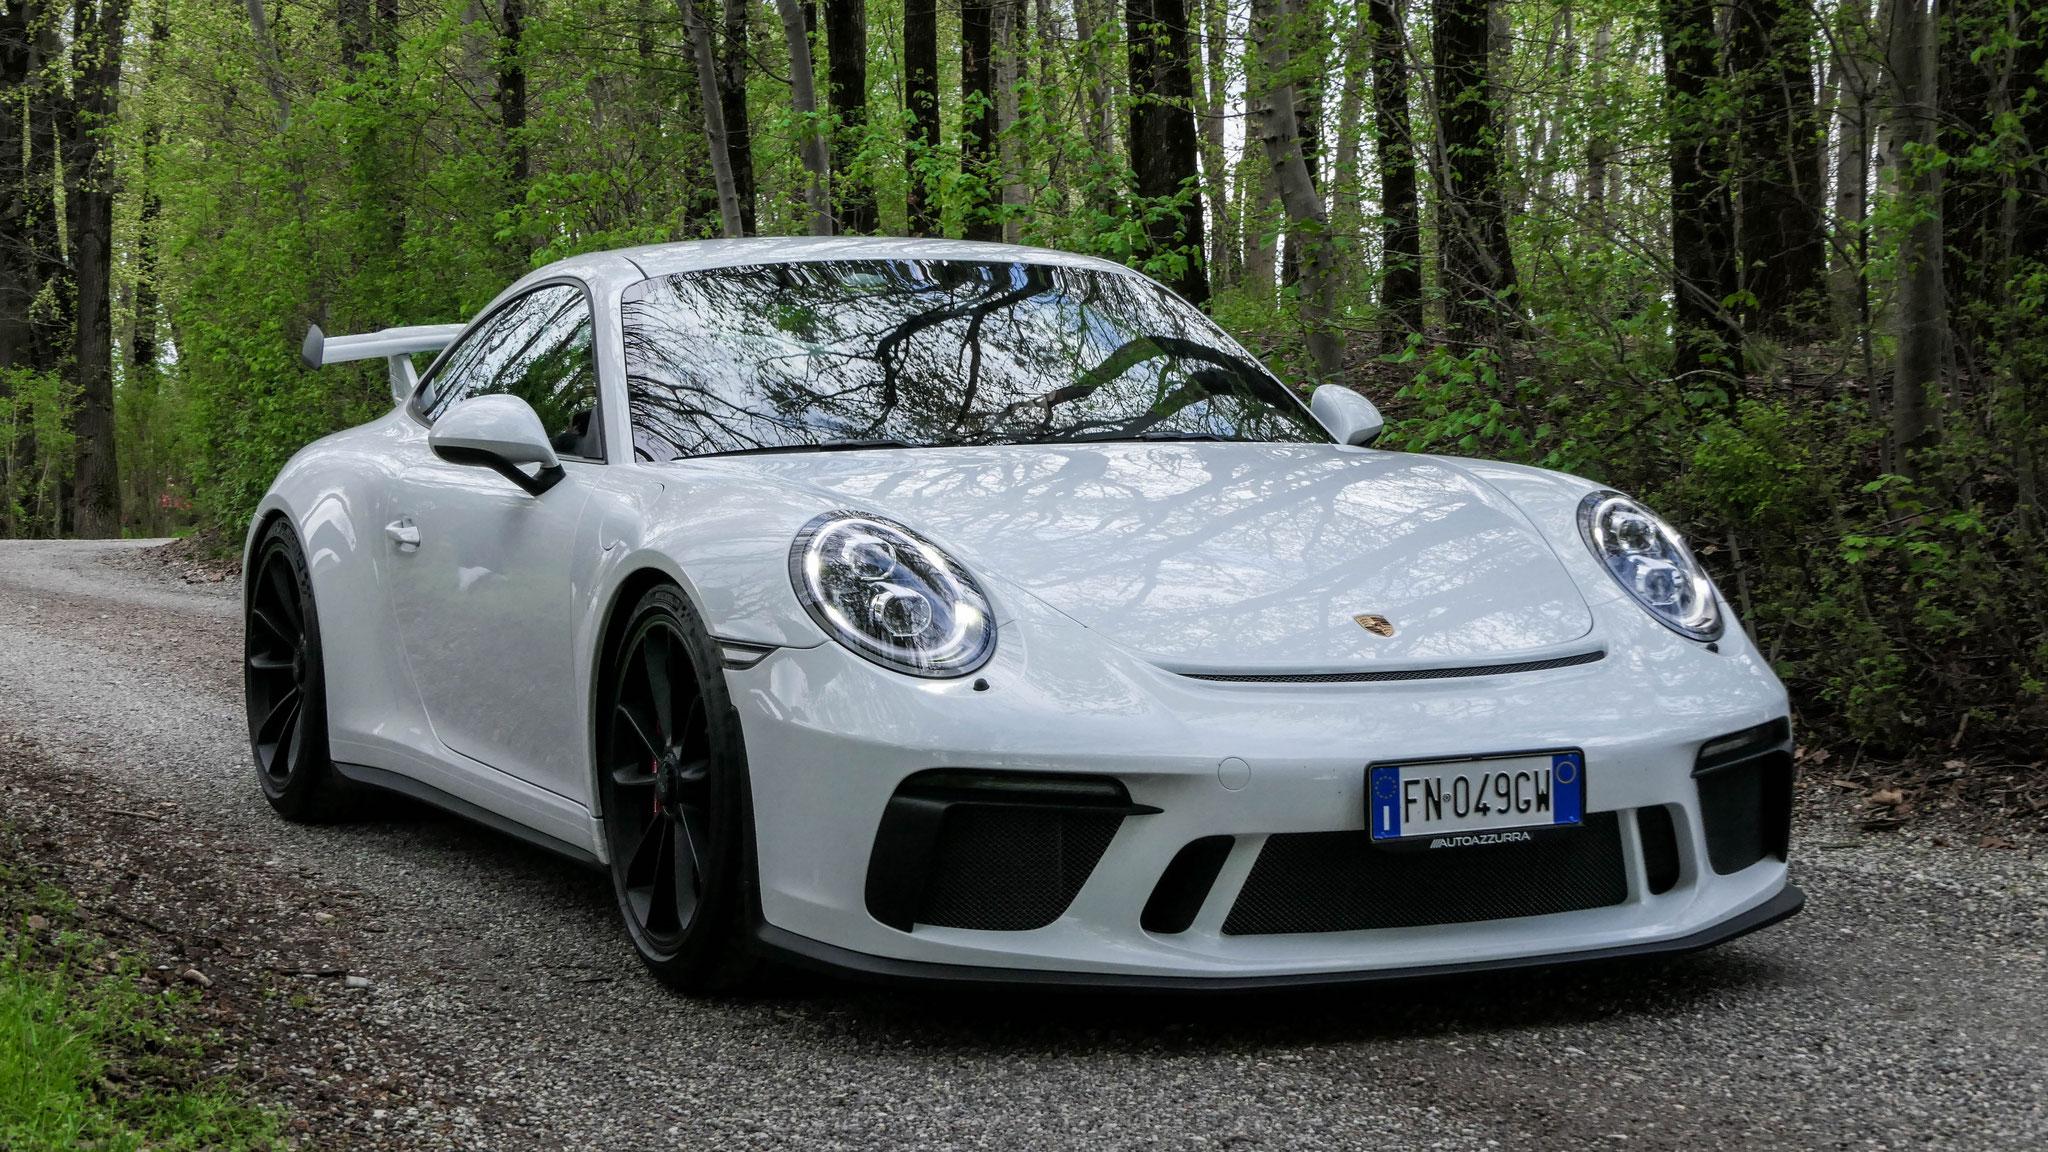 Porsche 991 GT3 - FN-049-GW (ITA)